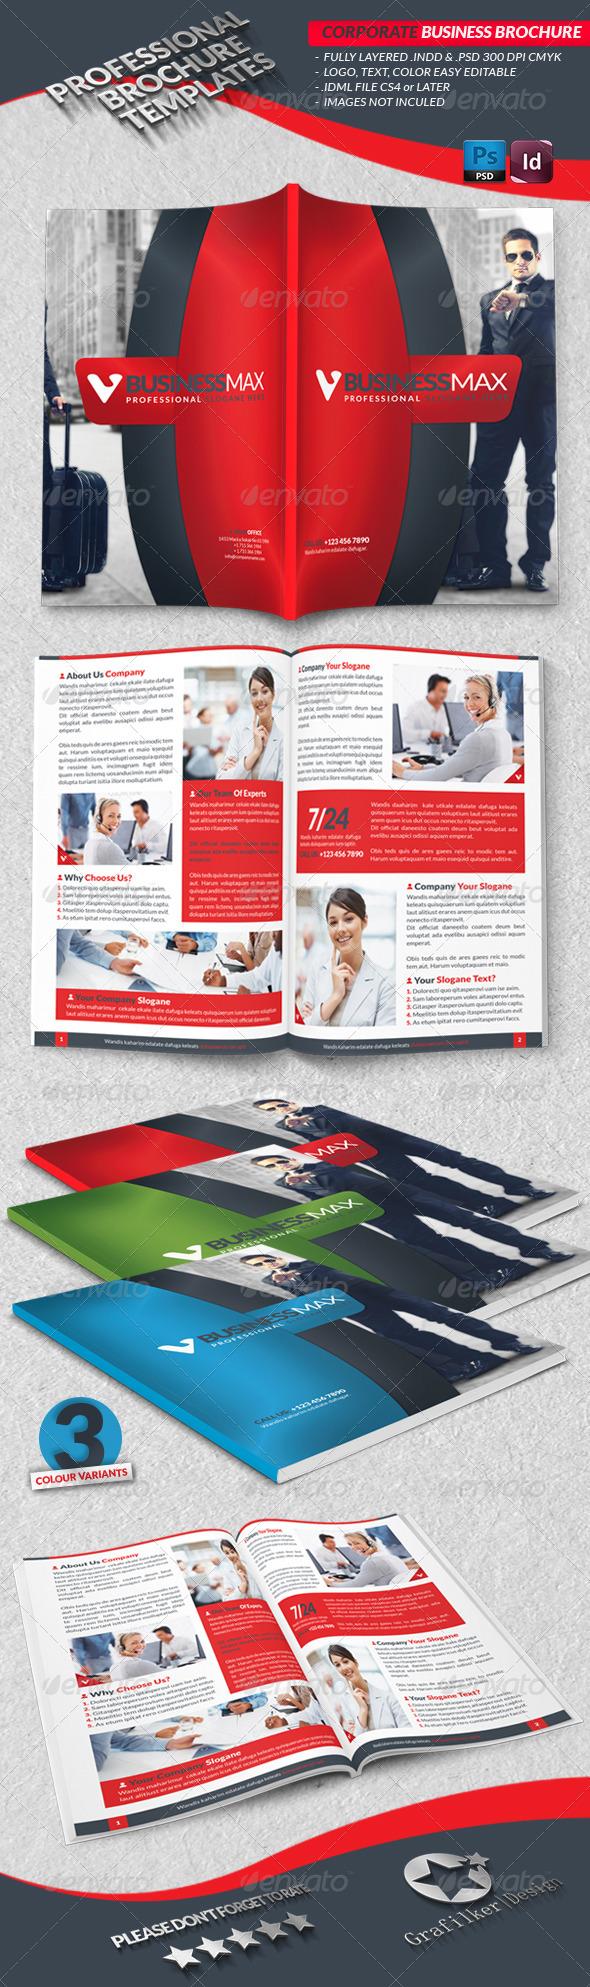 Corporate Business Brochure  - Brochures Print Templates